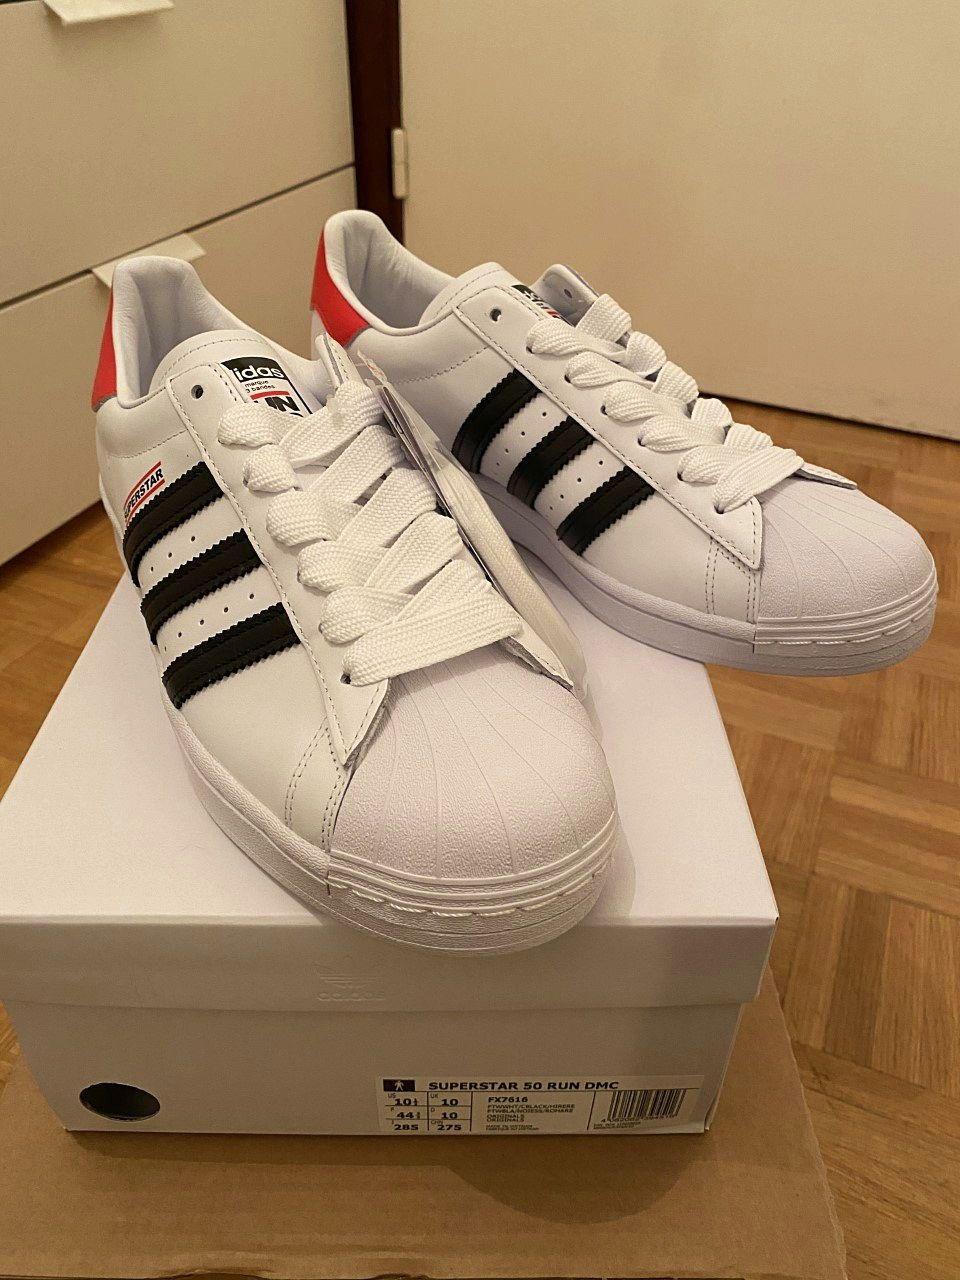 Vends Adidas Superstar 50RUN DMC (taille 44,5) (NEUVES)